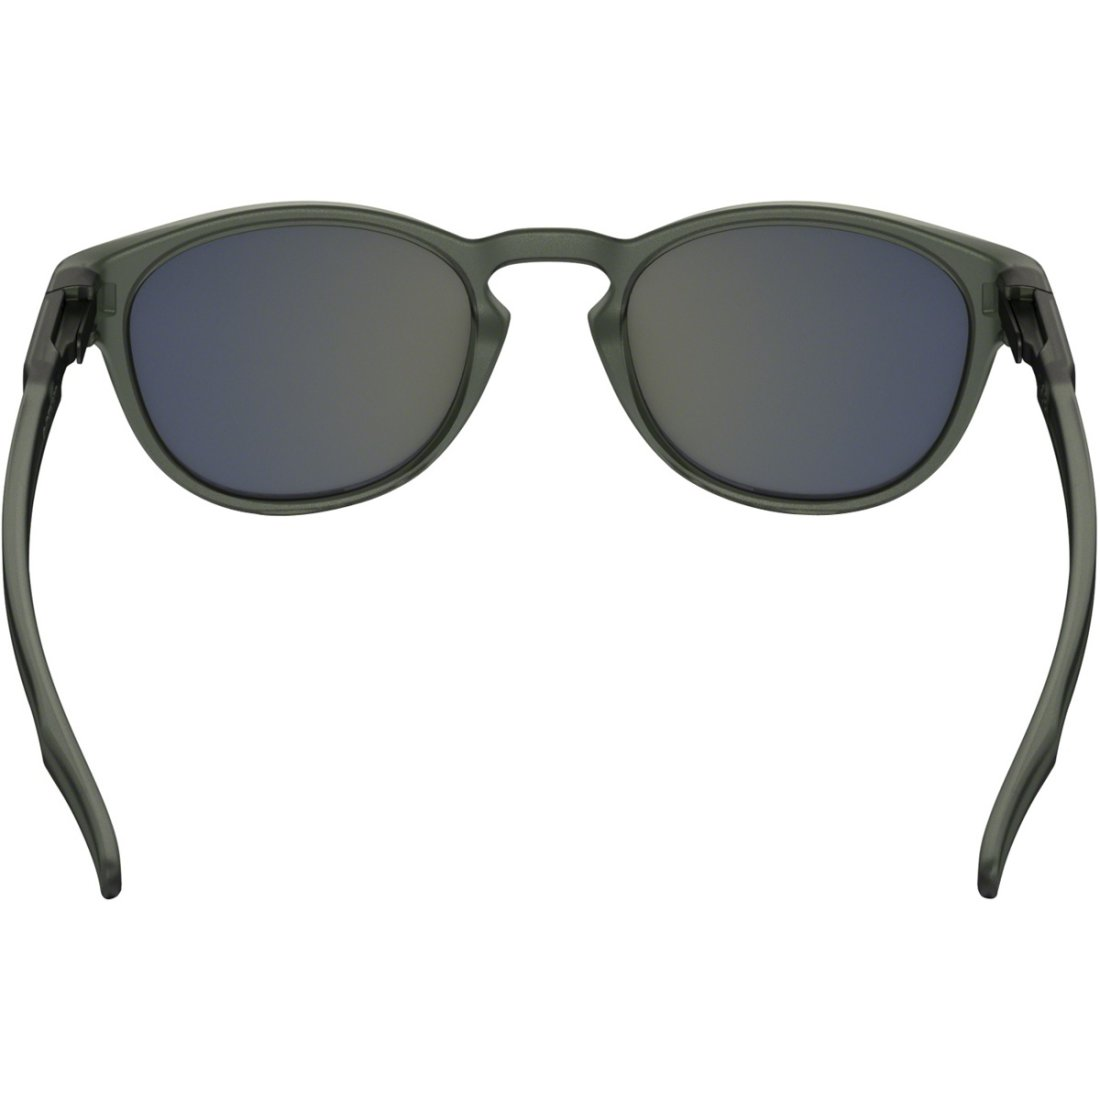 5bbba7ef54 OAKLEY Latch Matte Olive Ink   Emerald Iridium Sun glasses · Motocard